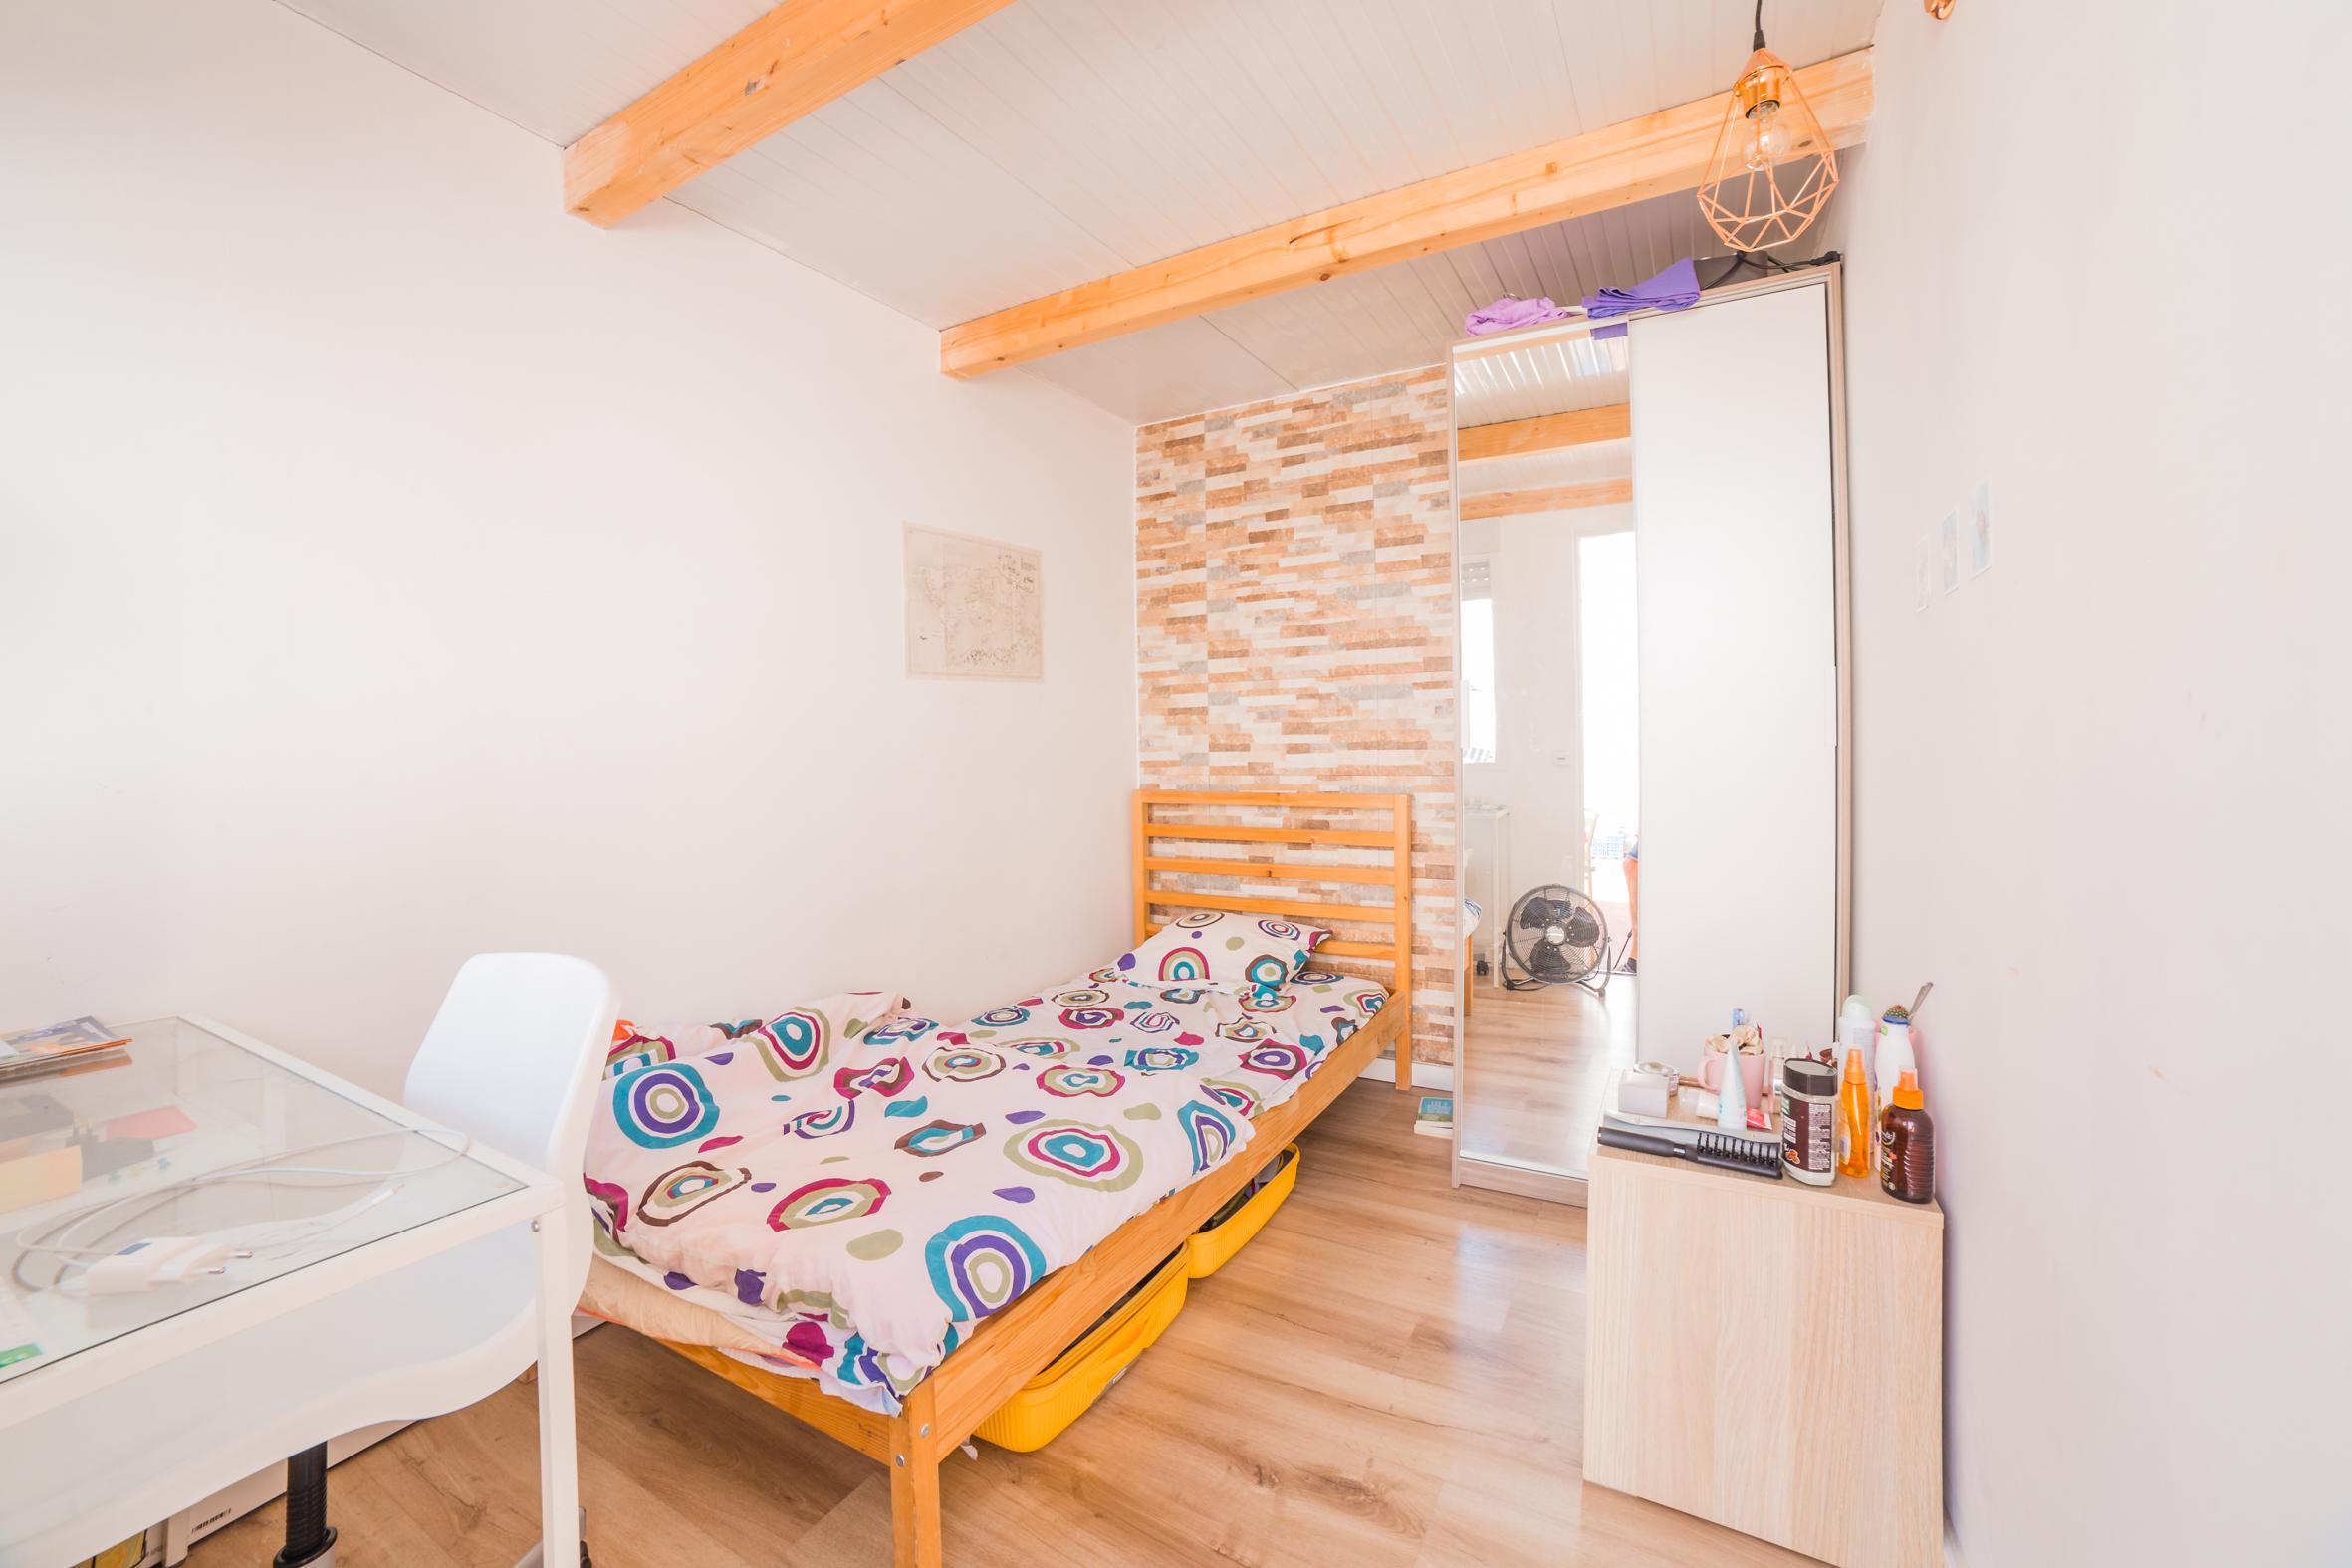 251960 House for sale in Eixample, Sagrada Familia 4